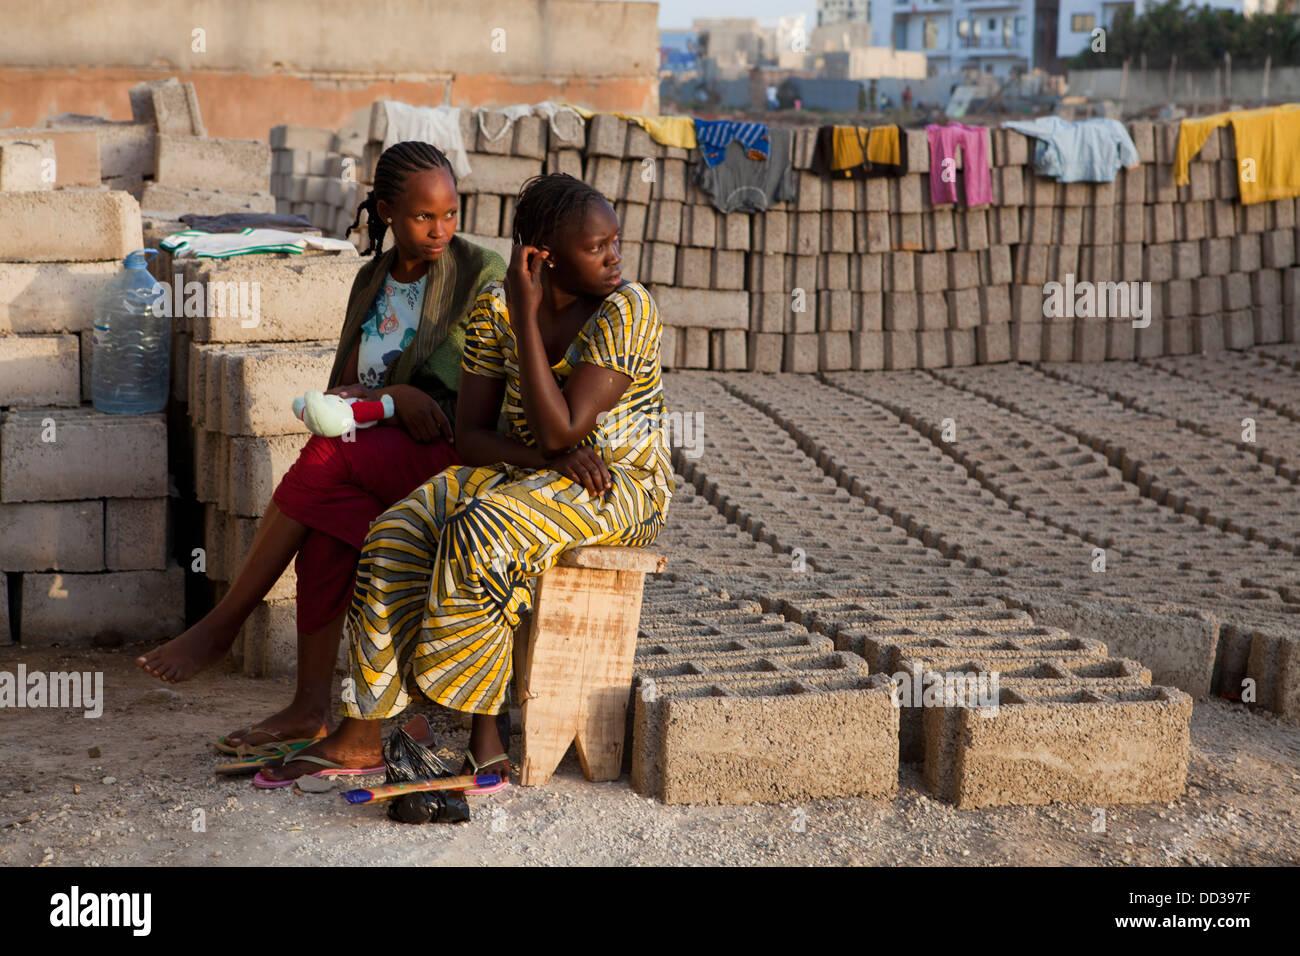 Daily life in suburban Dakar, Senegal. - Stock Image